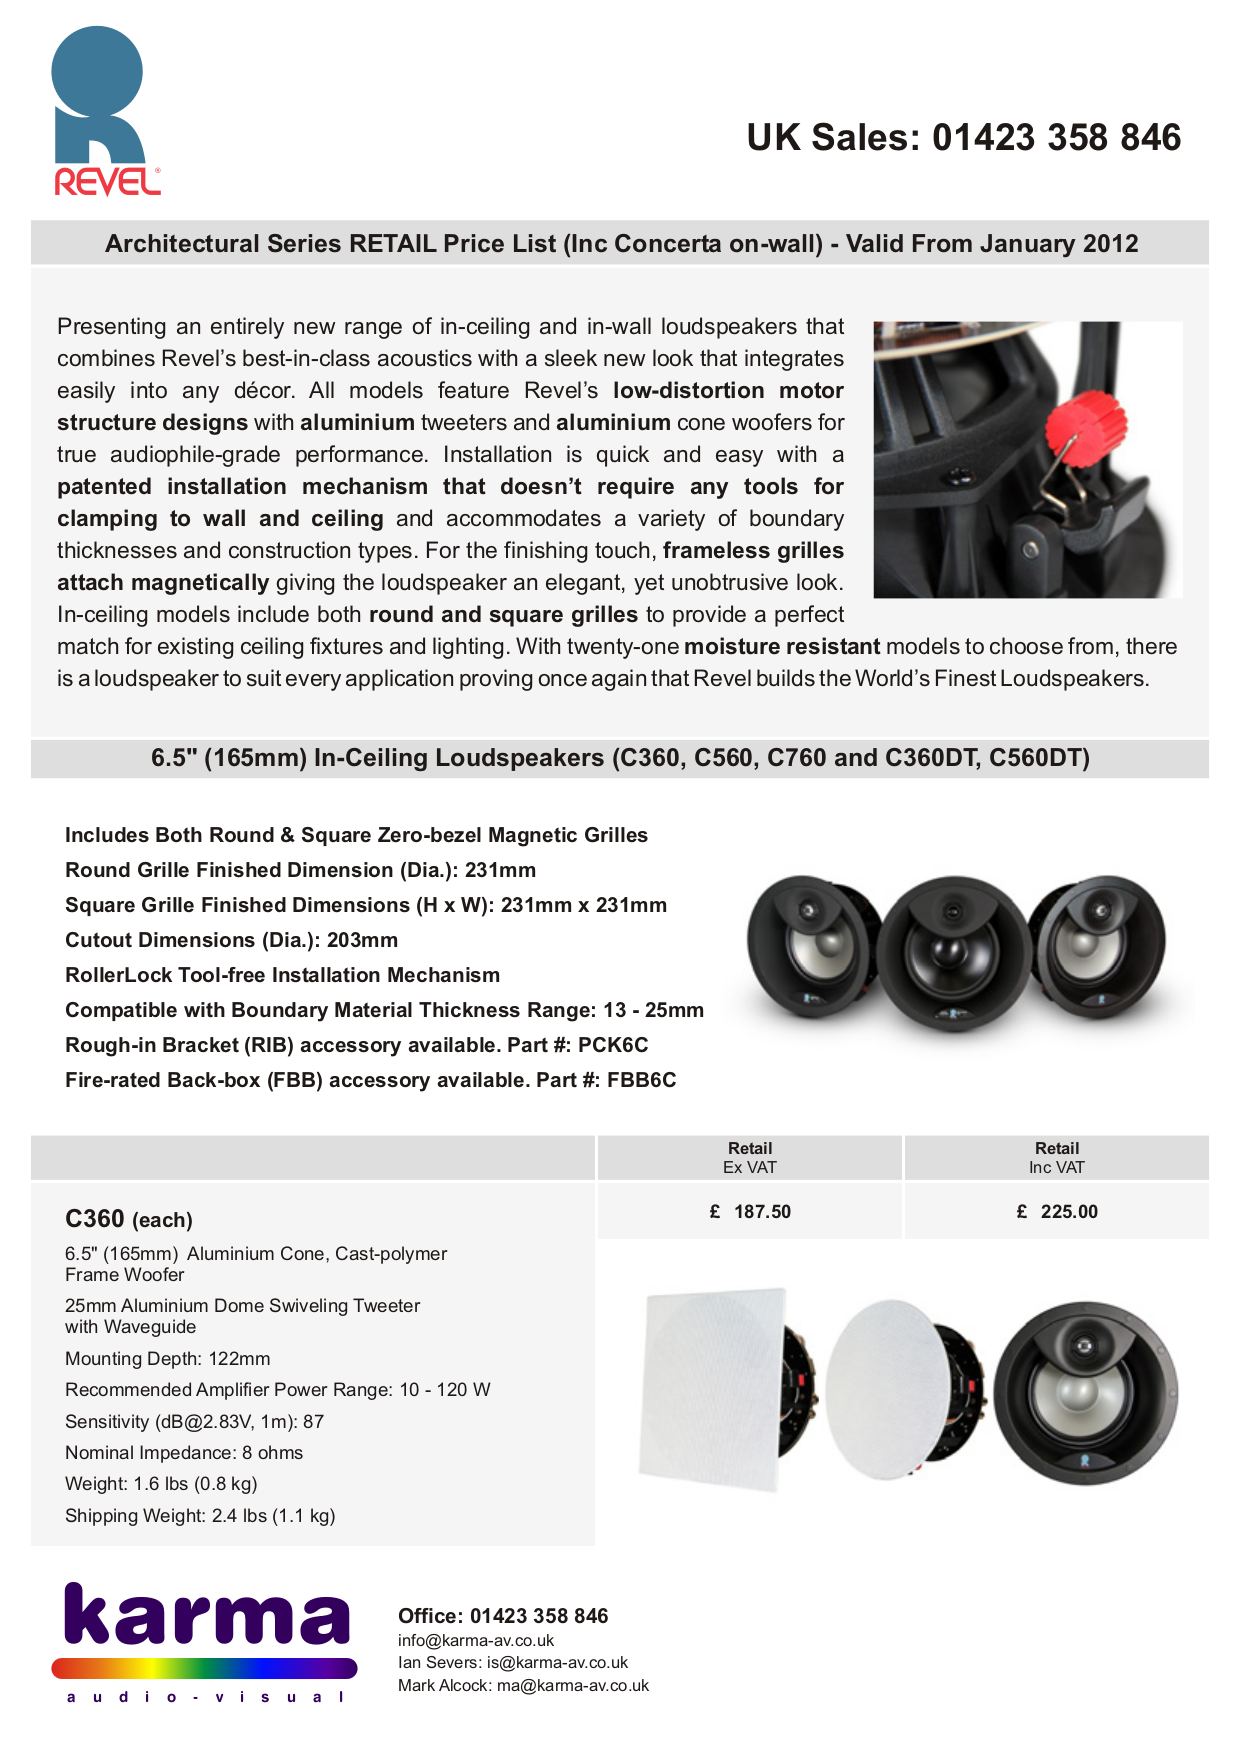 pdf for Revel Speaker Concerta IW80 manual